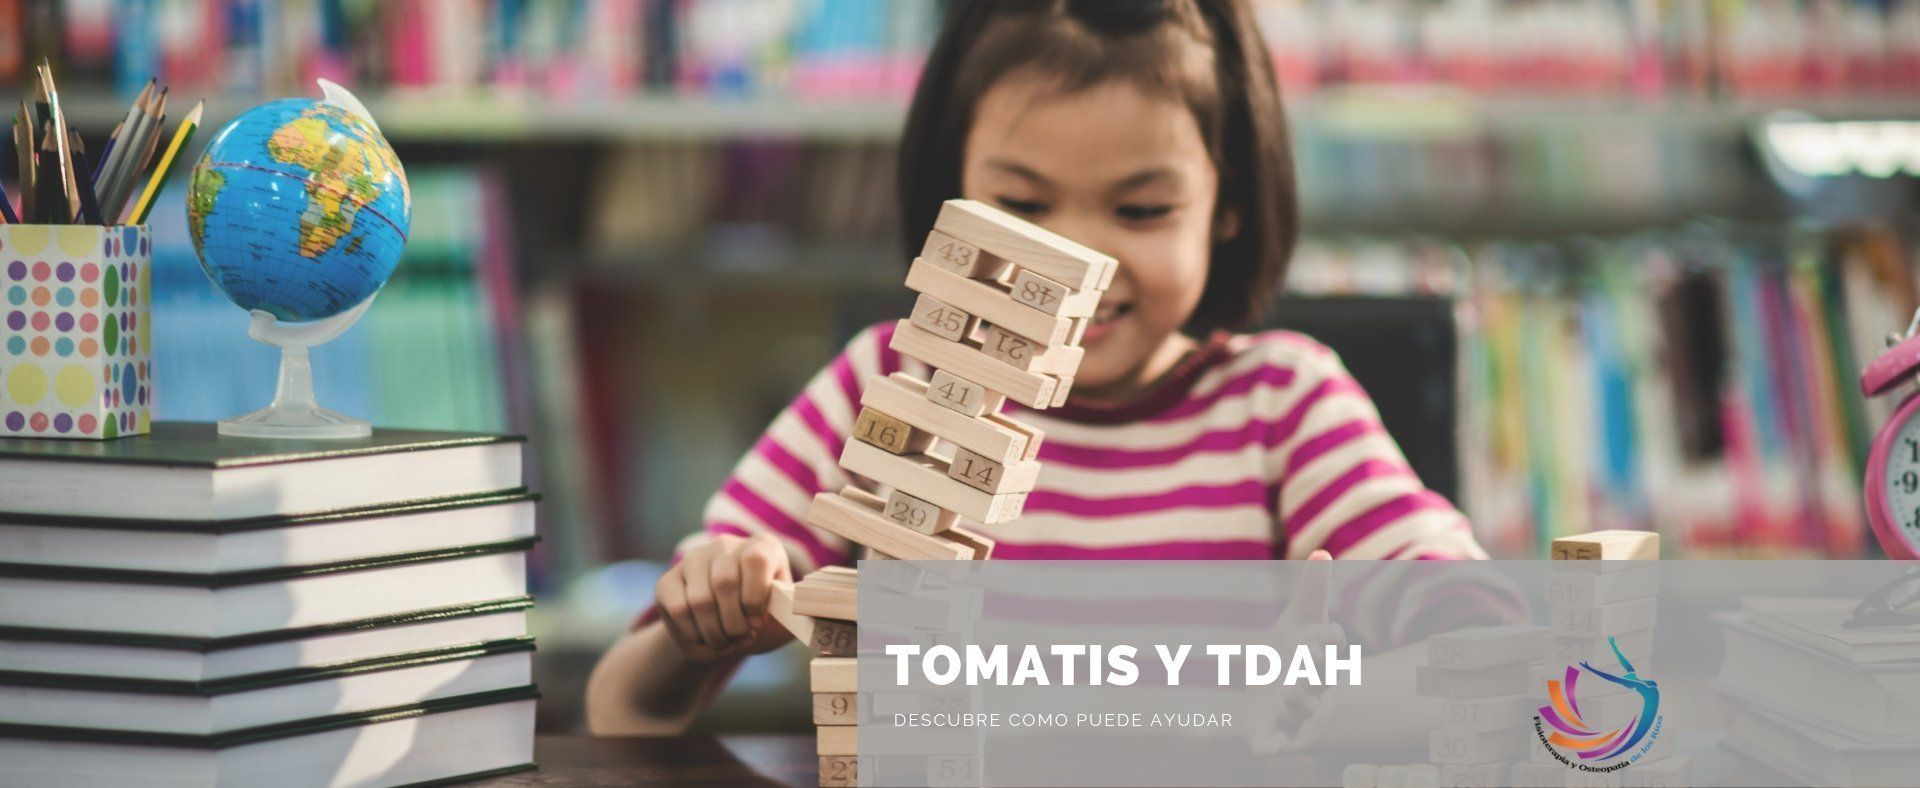 Tomatis y TDAH